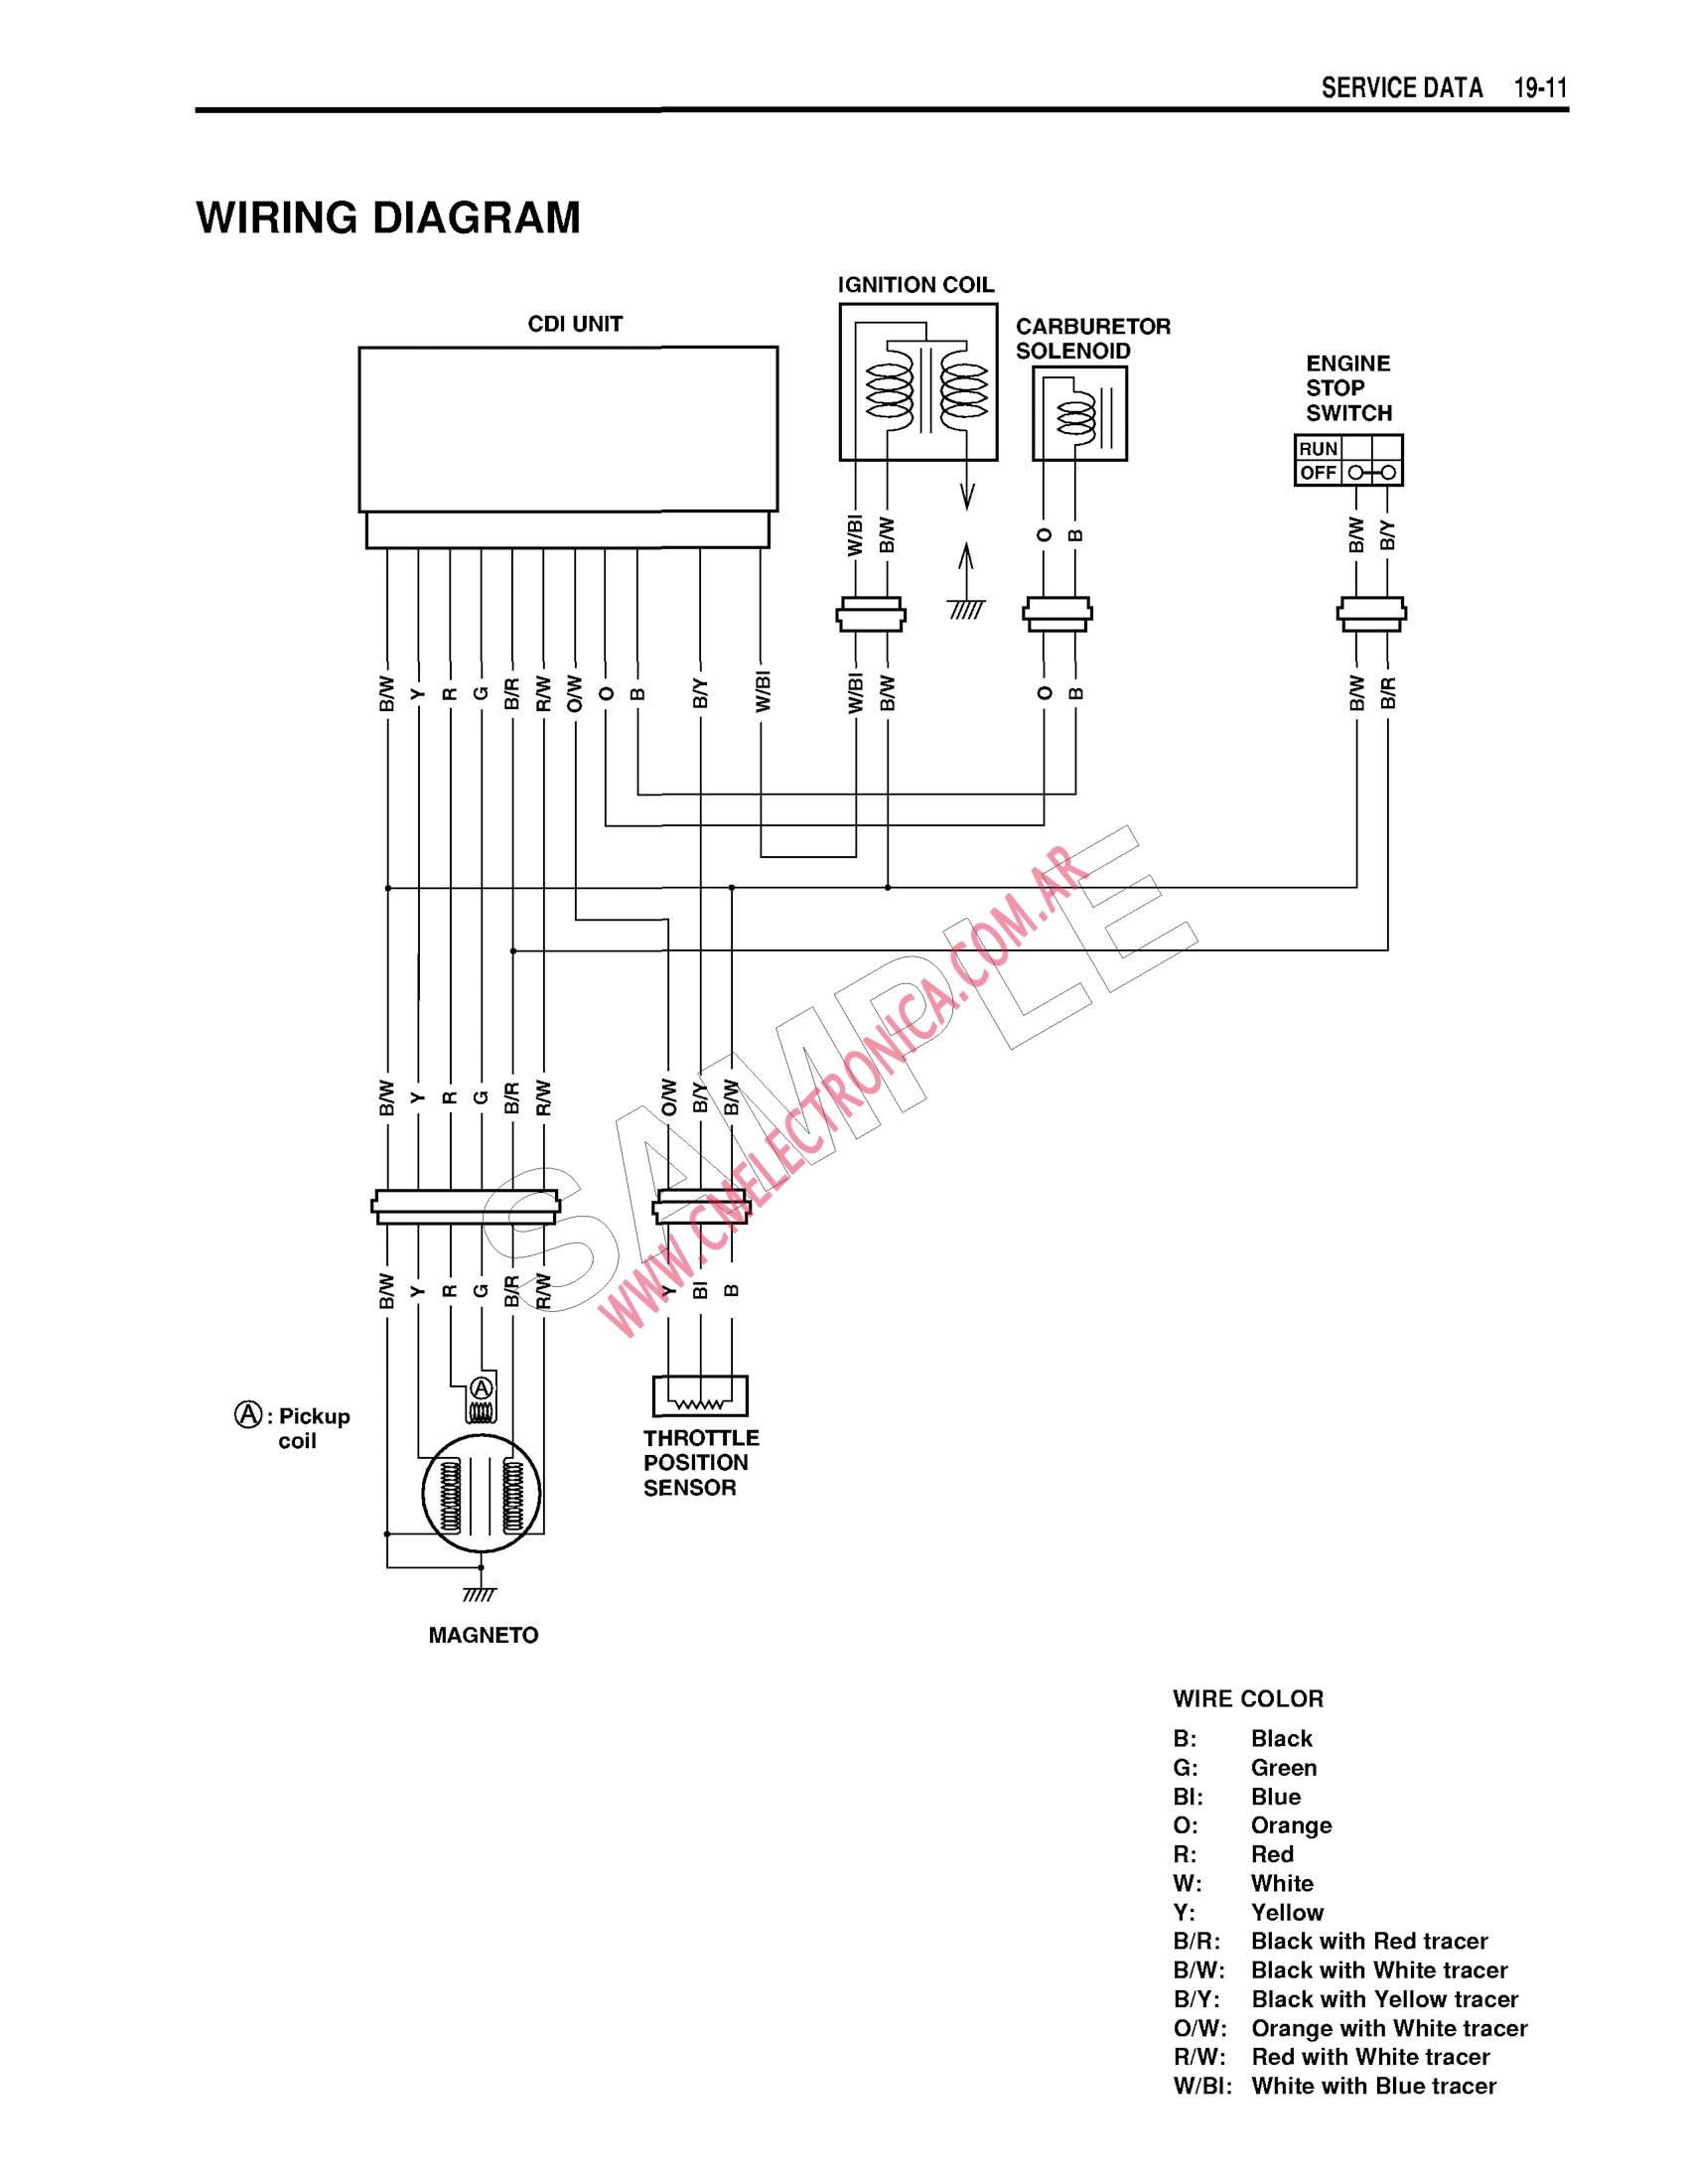 1992 Suzuki 250 Quad Wiring - Wiring Diagram Replace note-random -  note-random.miramontiseo.it